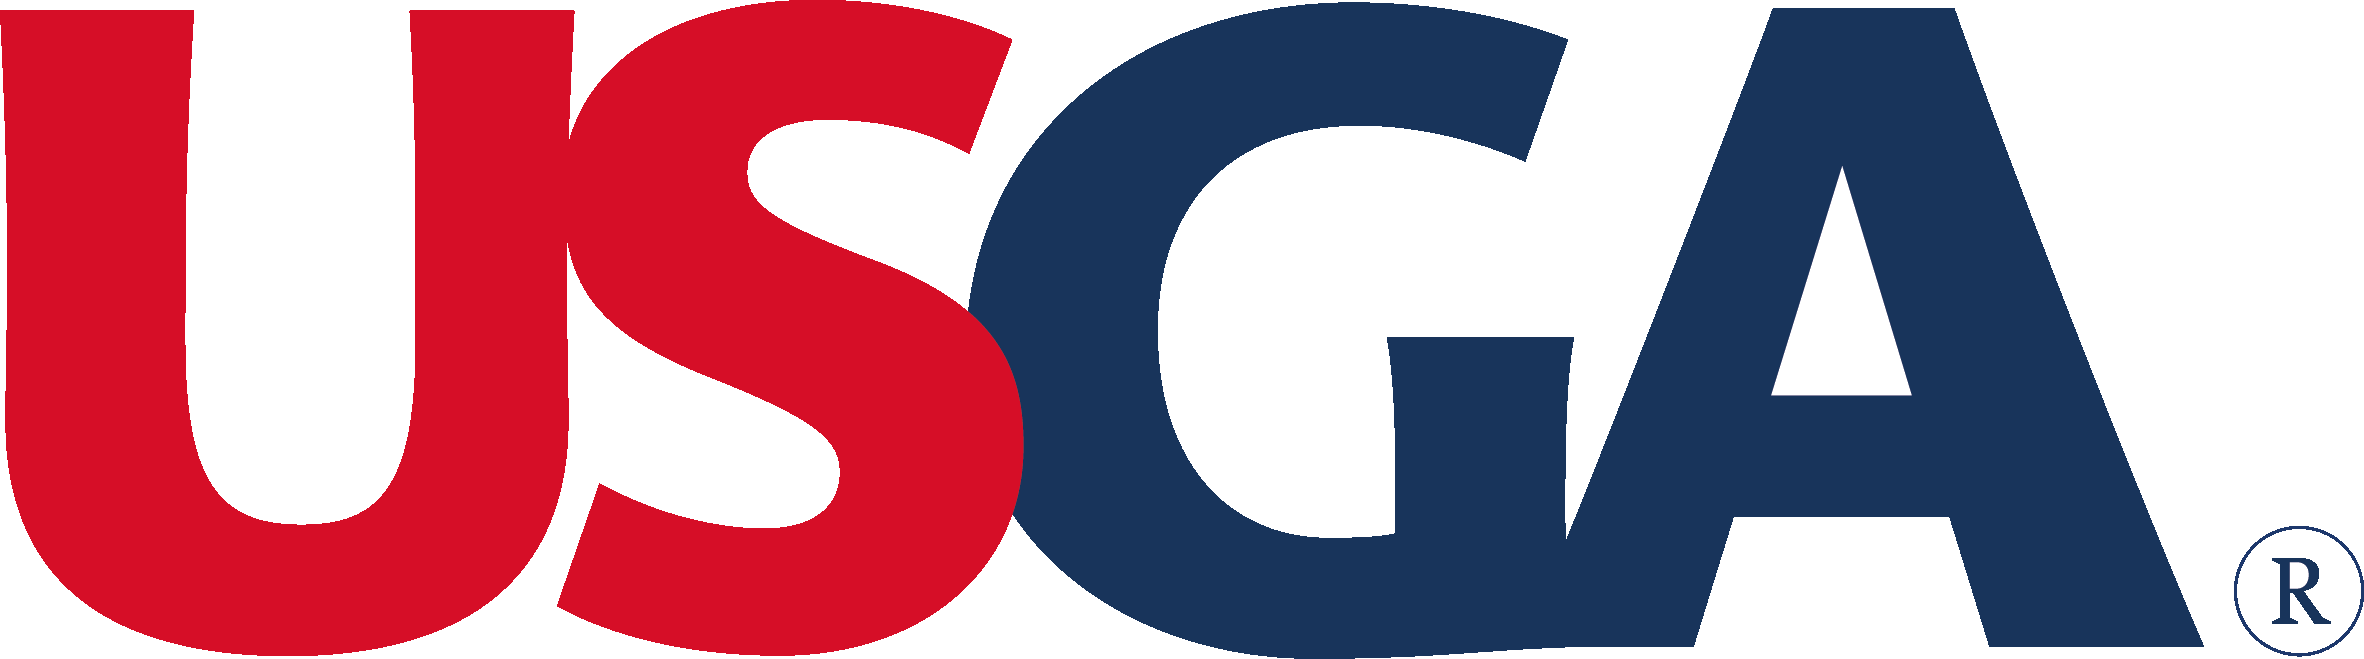 United States Golf Association (USGA) Logo [usga.org] png